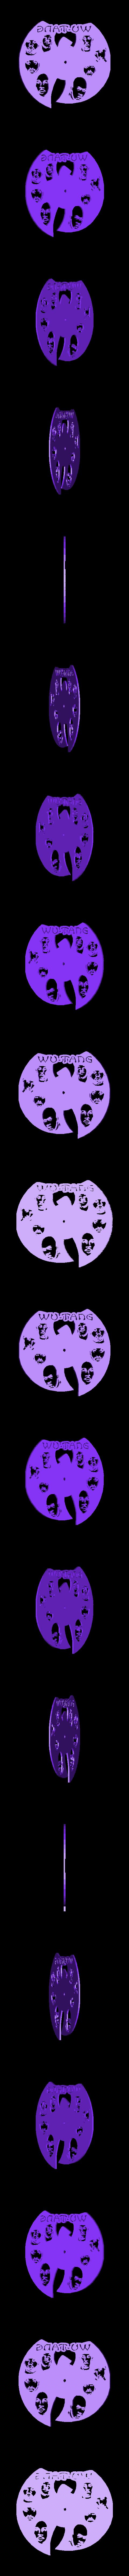 WuTang_Reloj.stl Download STL file Clock vinyl collection • 3D printer design, razoner